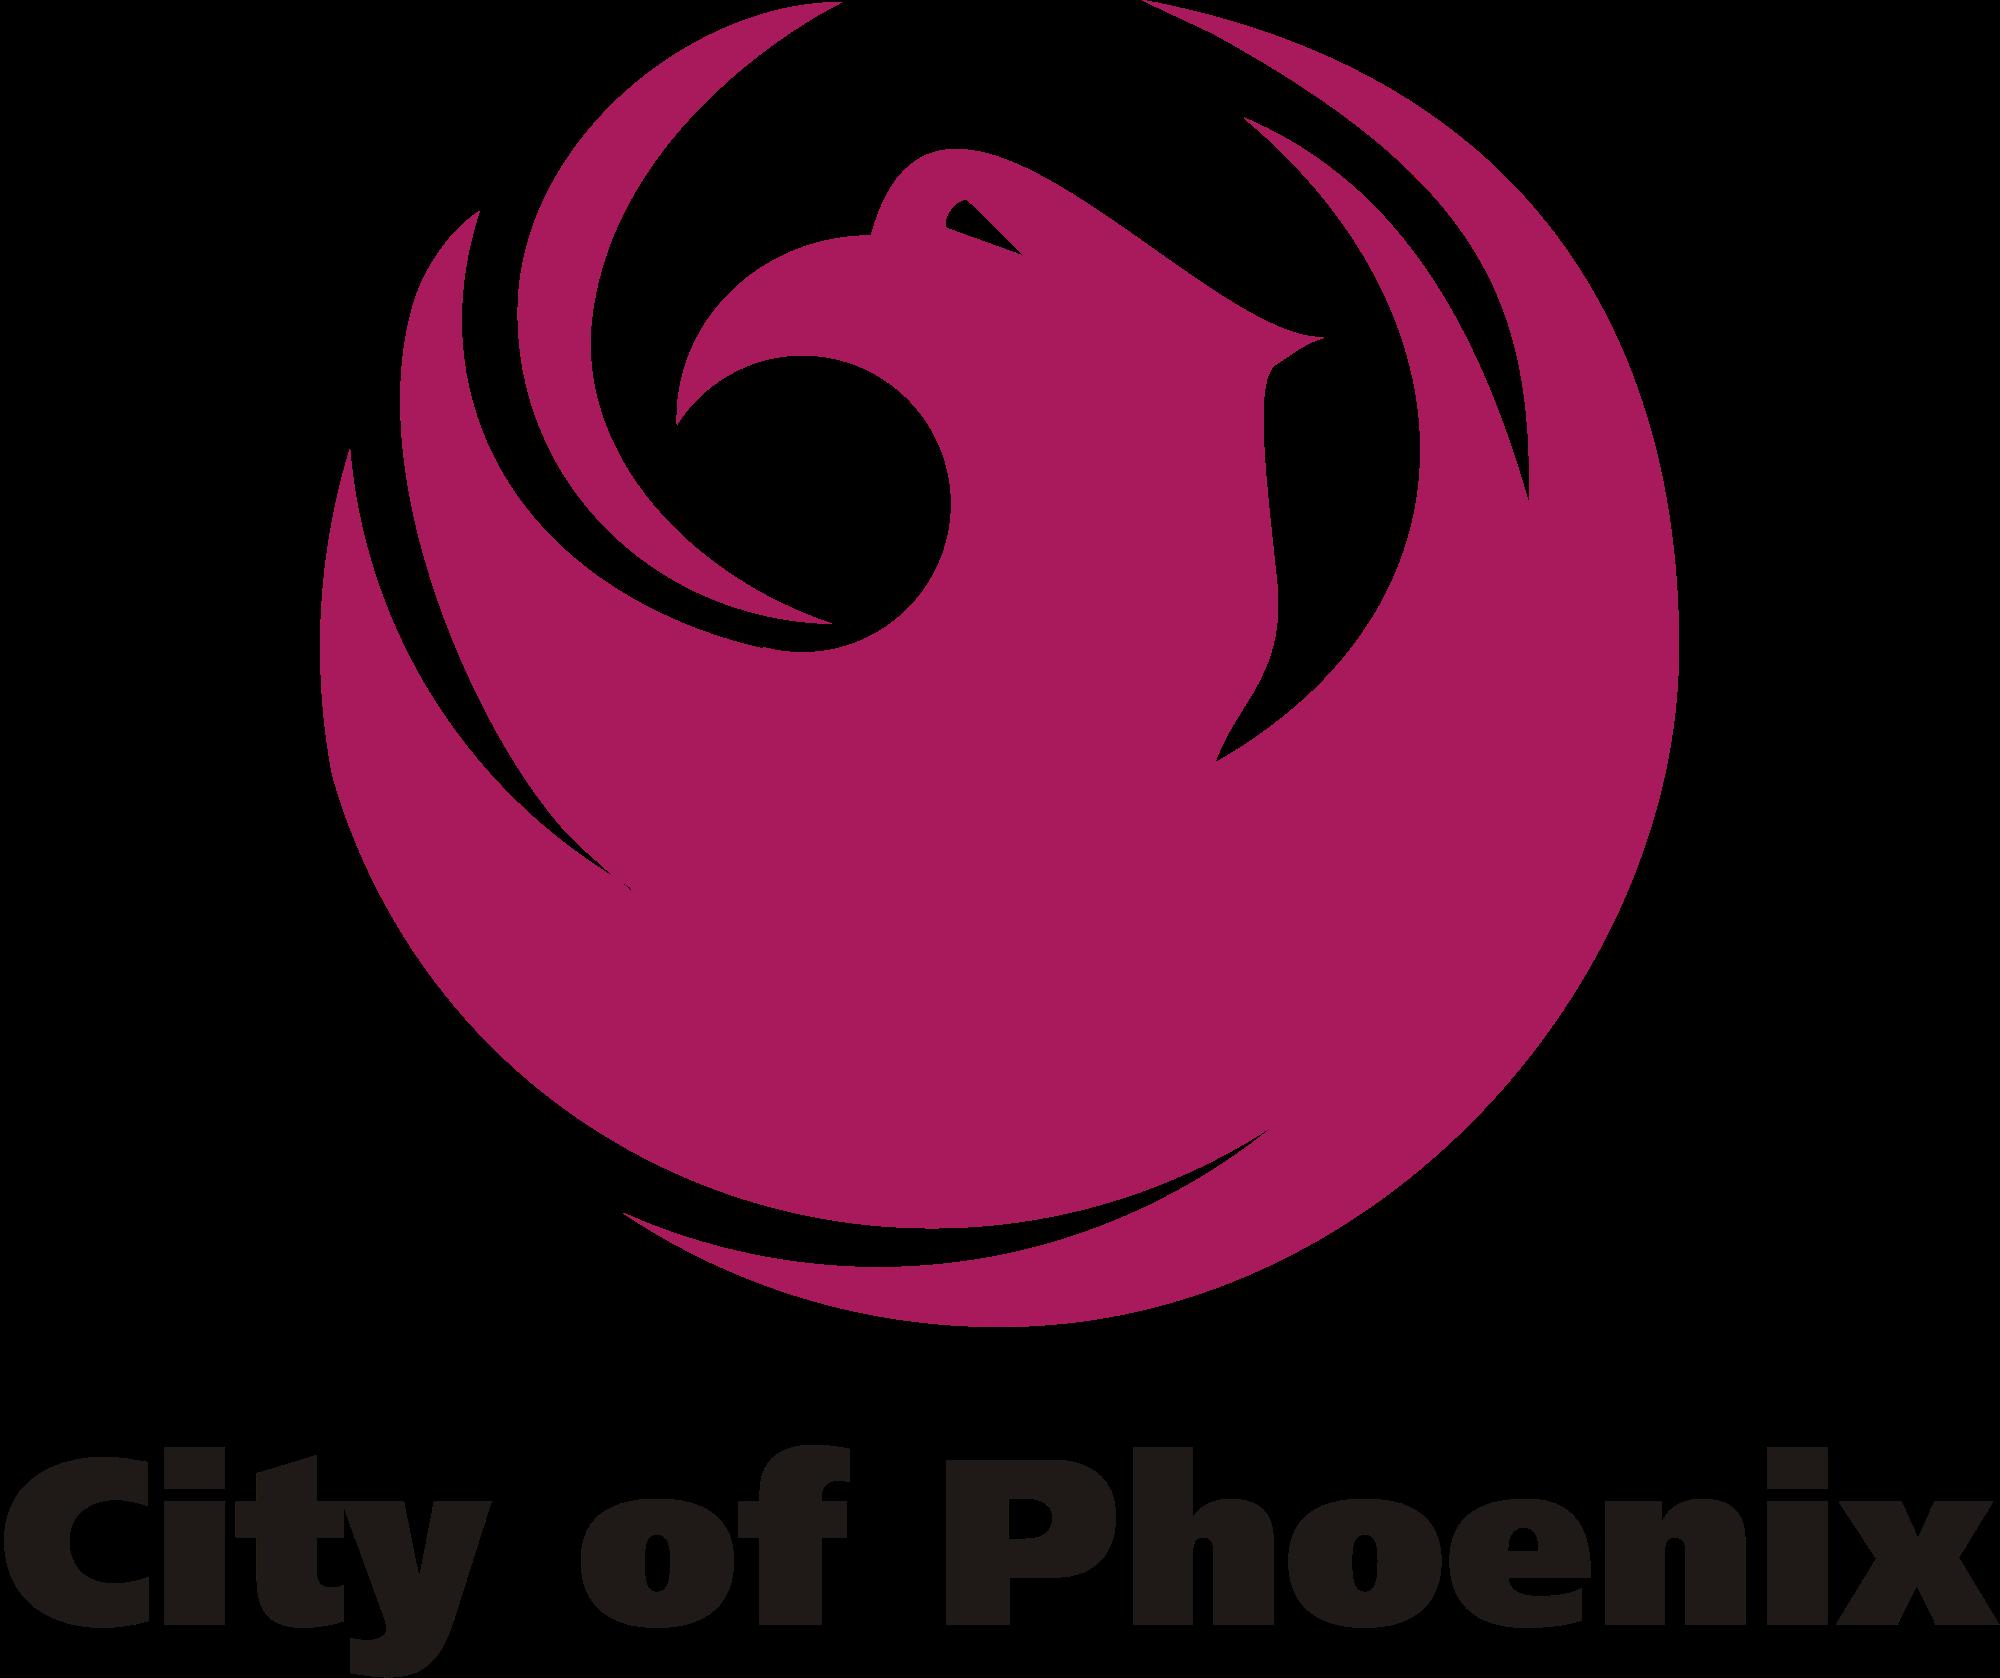 City of Phoenix.png